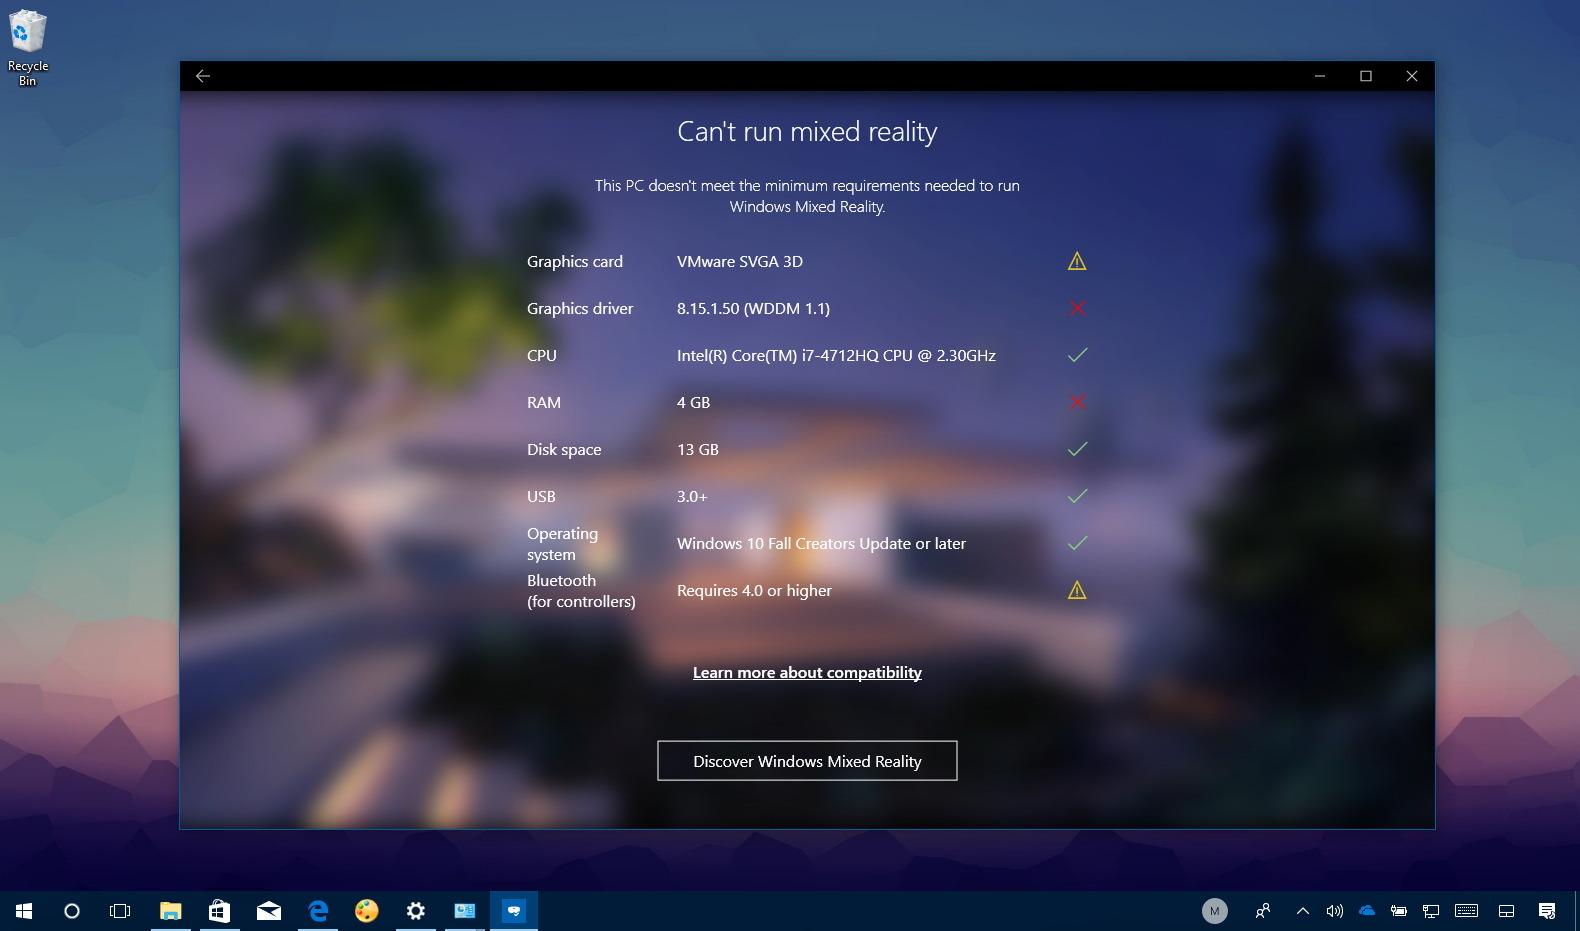 Windows Mixed Reality PC check app